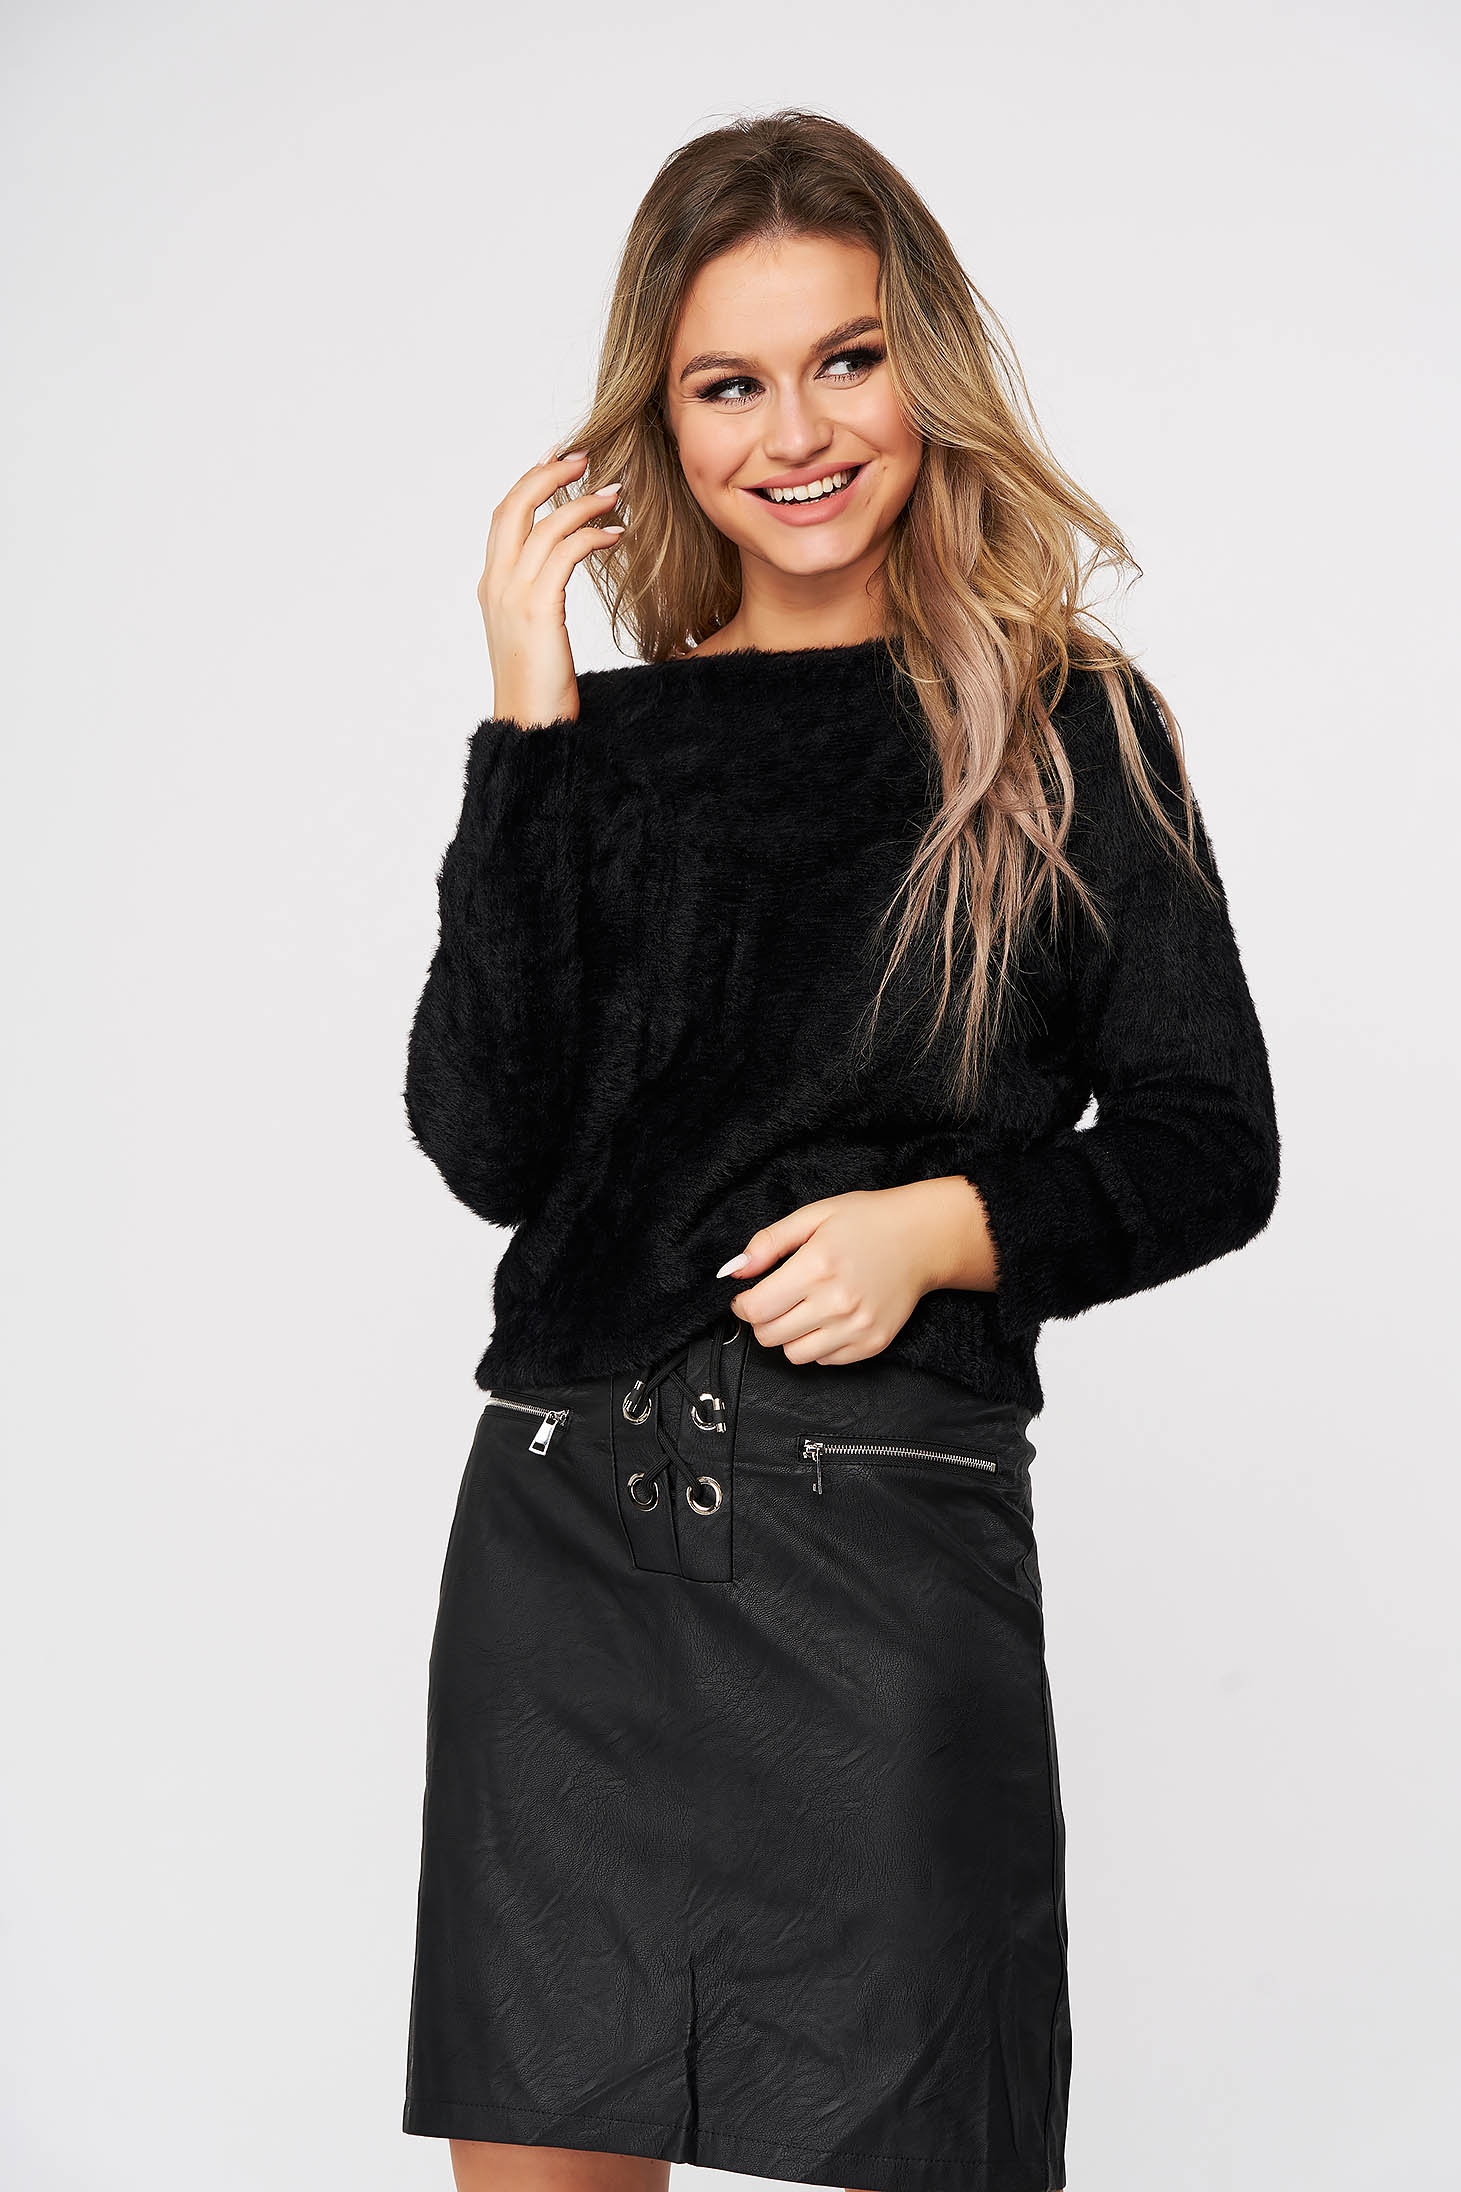 Pulover SunShine negru casual din material pufos tricotat cu croi larg